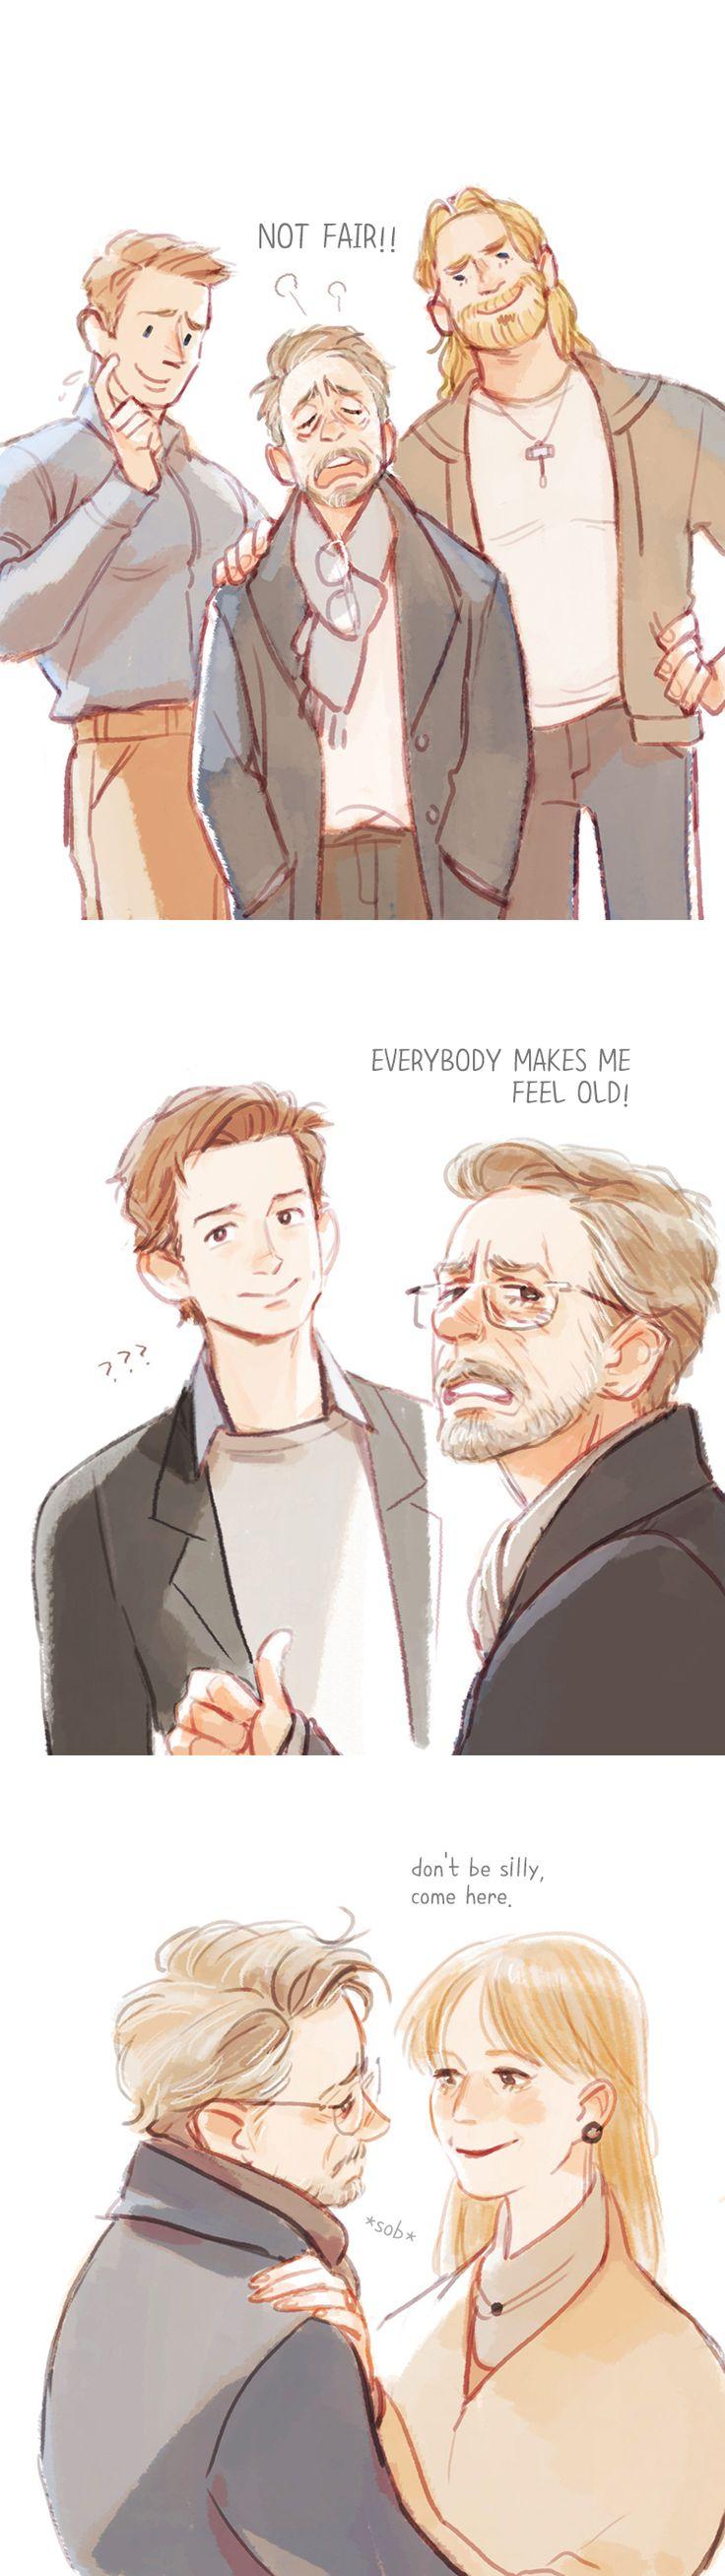 Tony Stark (Silver Fox) and Pepper Potts,Steve Rogers,Thor Odinson,Peter Parker